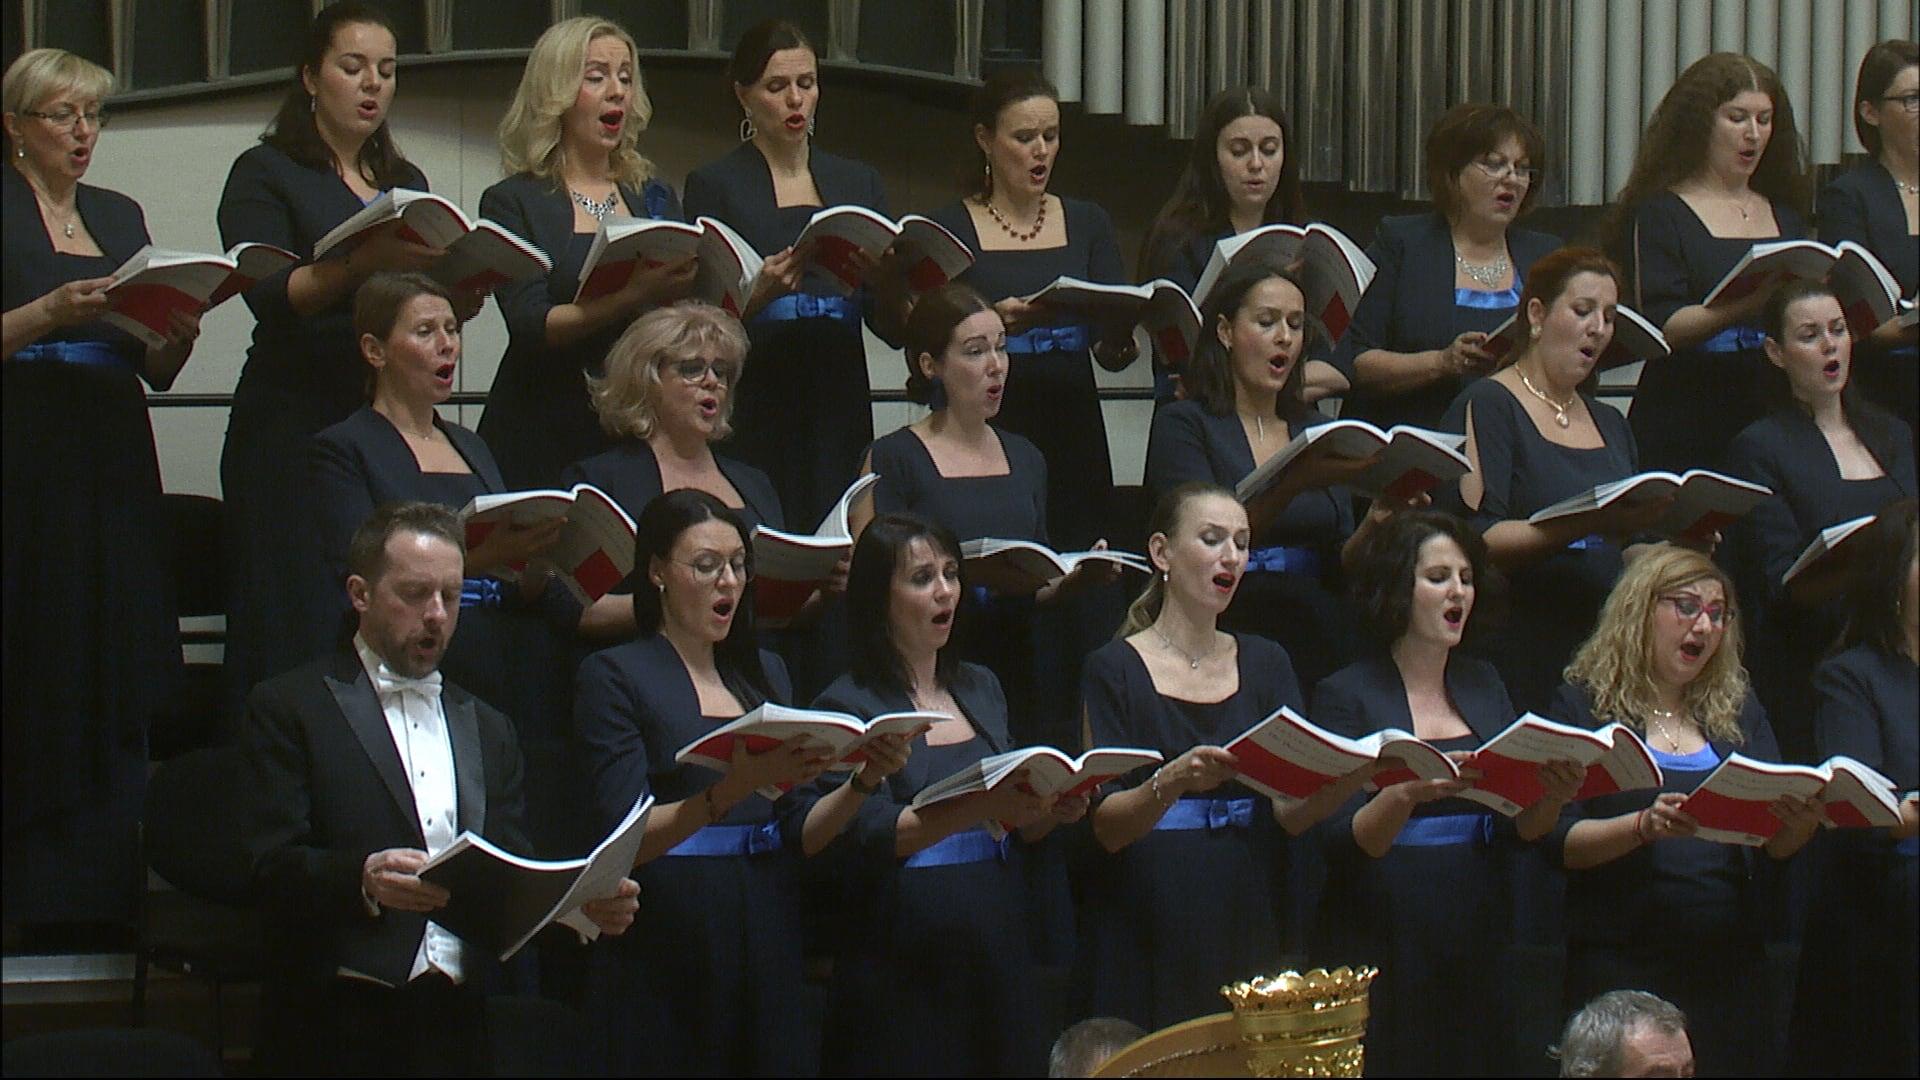 Edward Elgar – Gerontiov sen